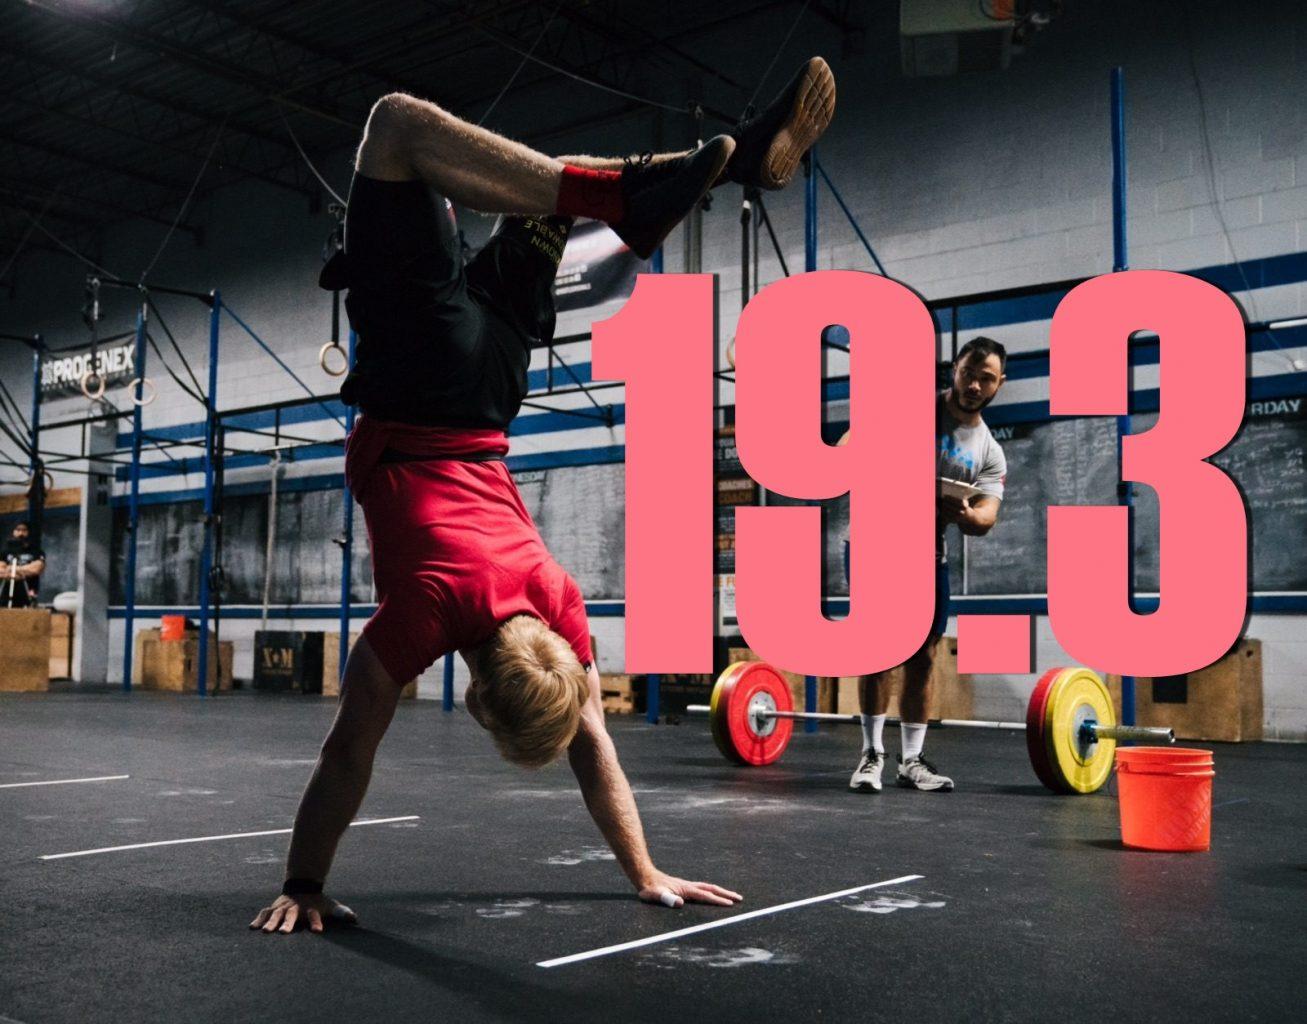 paul vellner 19.3 crossfit - Patrick Vellner habla tras el 19.3 | CrossFit 2019